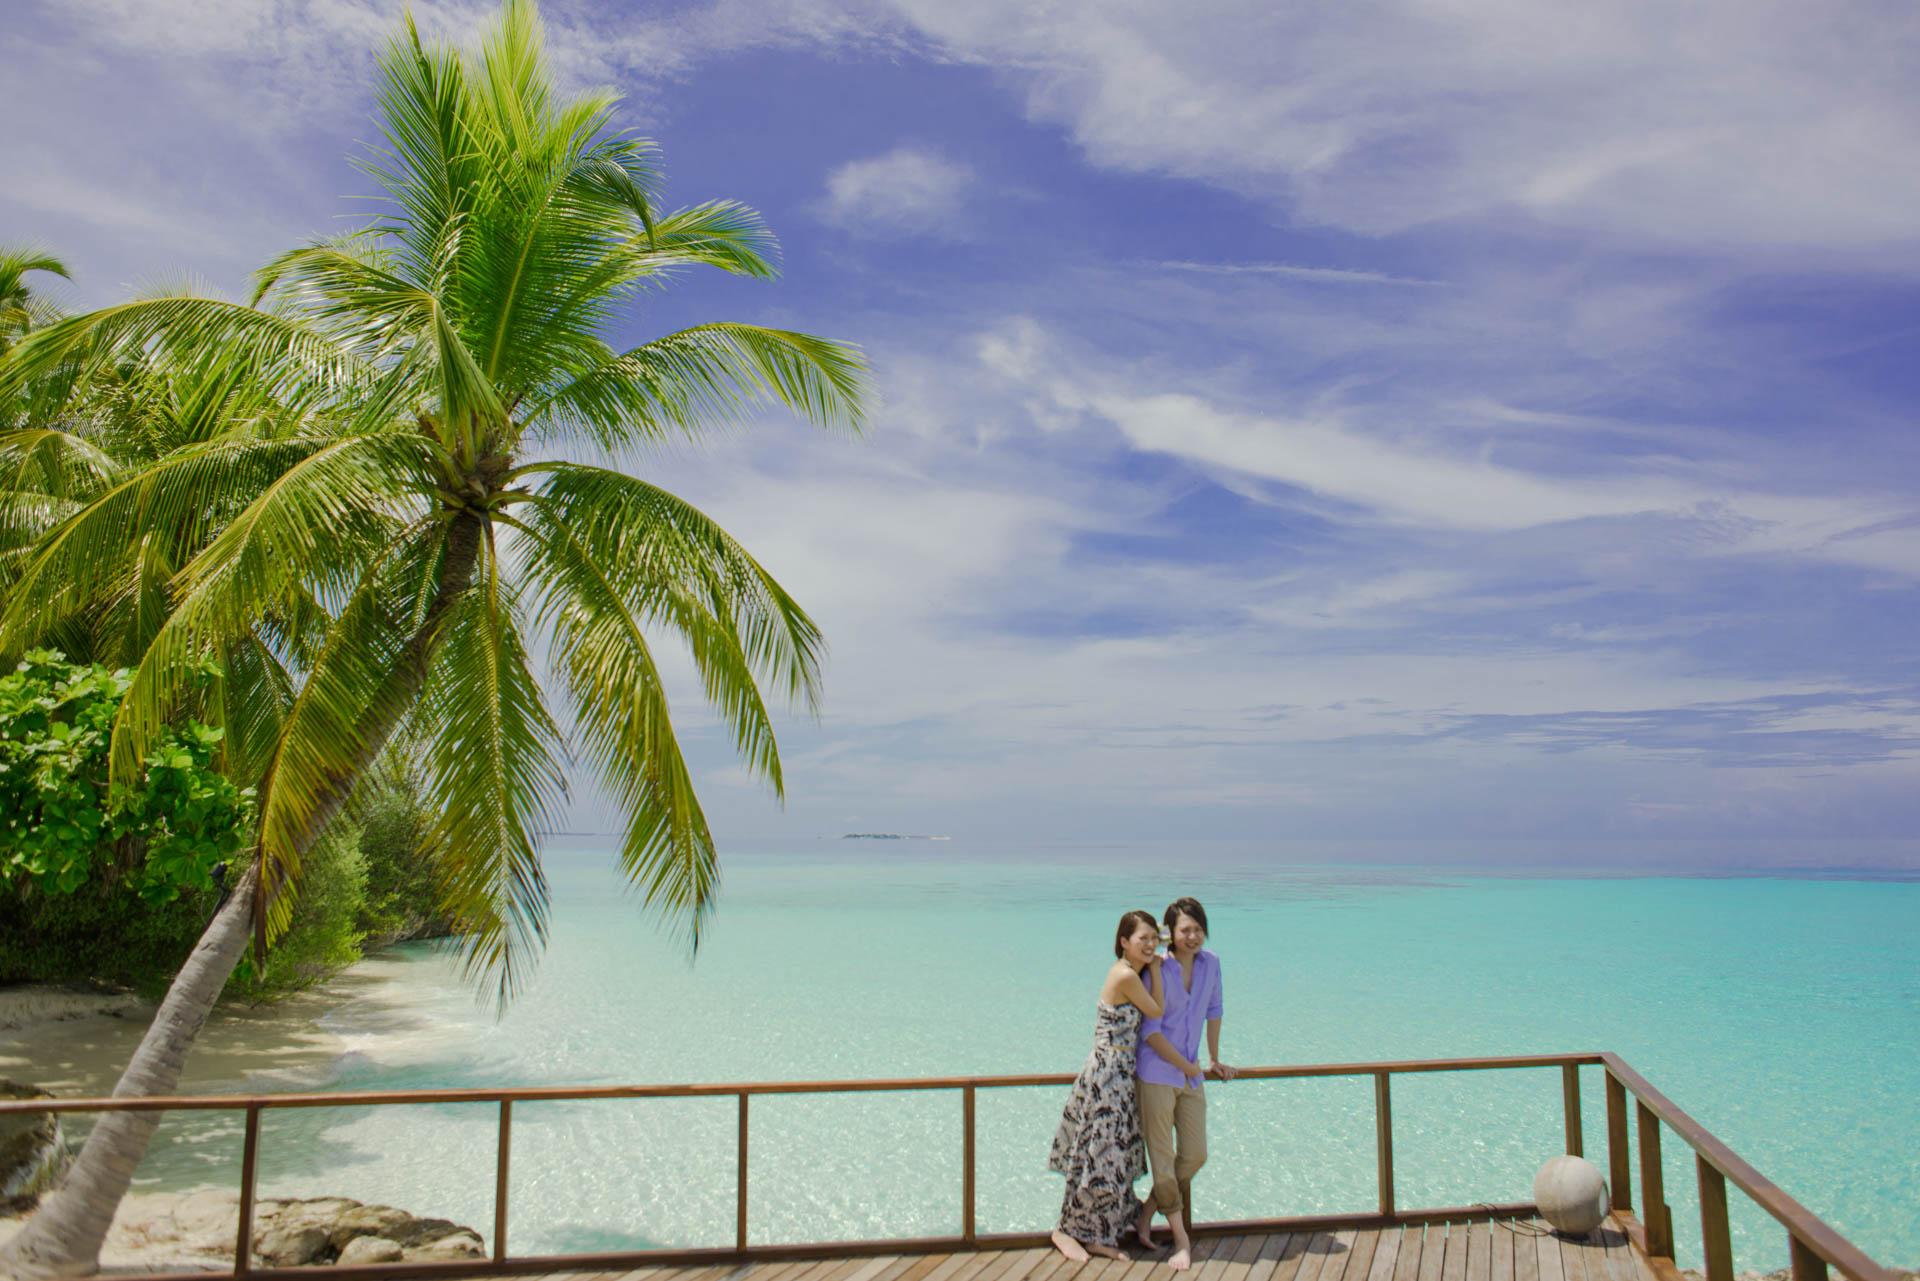 Devin and Natsuko Honeymoon at Makunudhoo Island Maldives 31